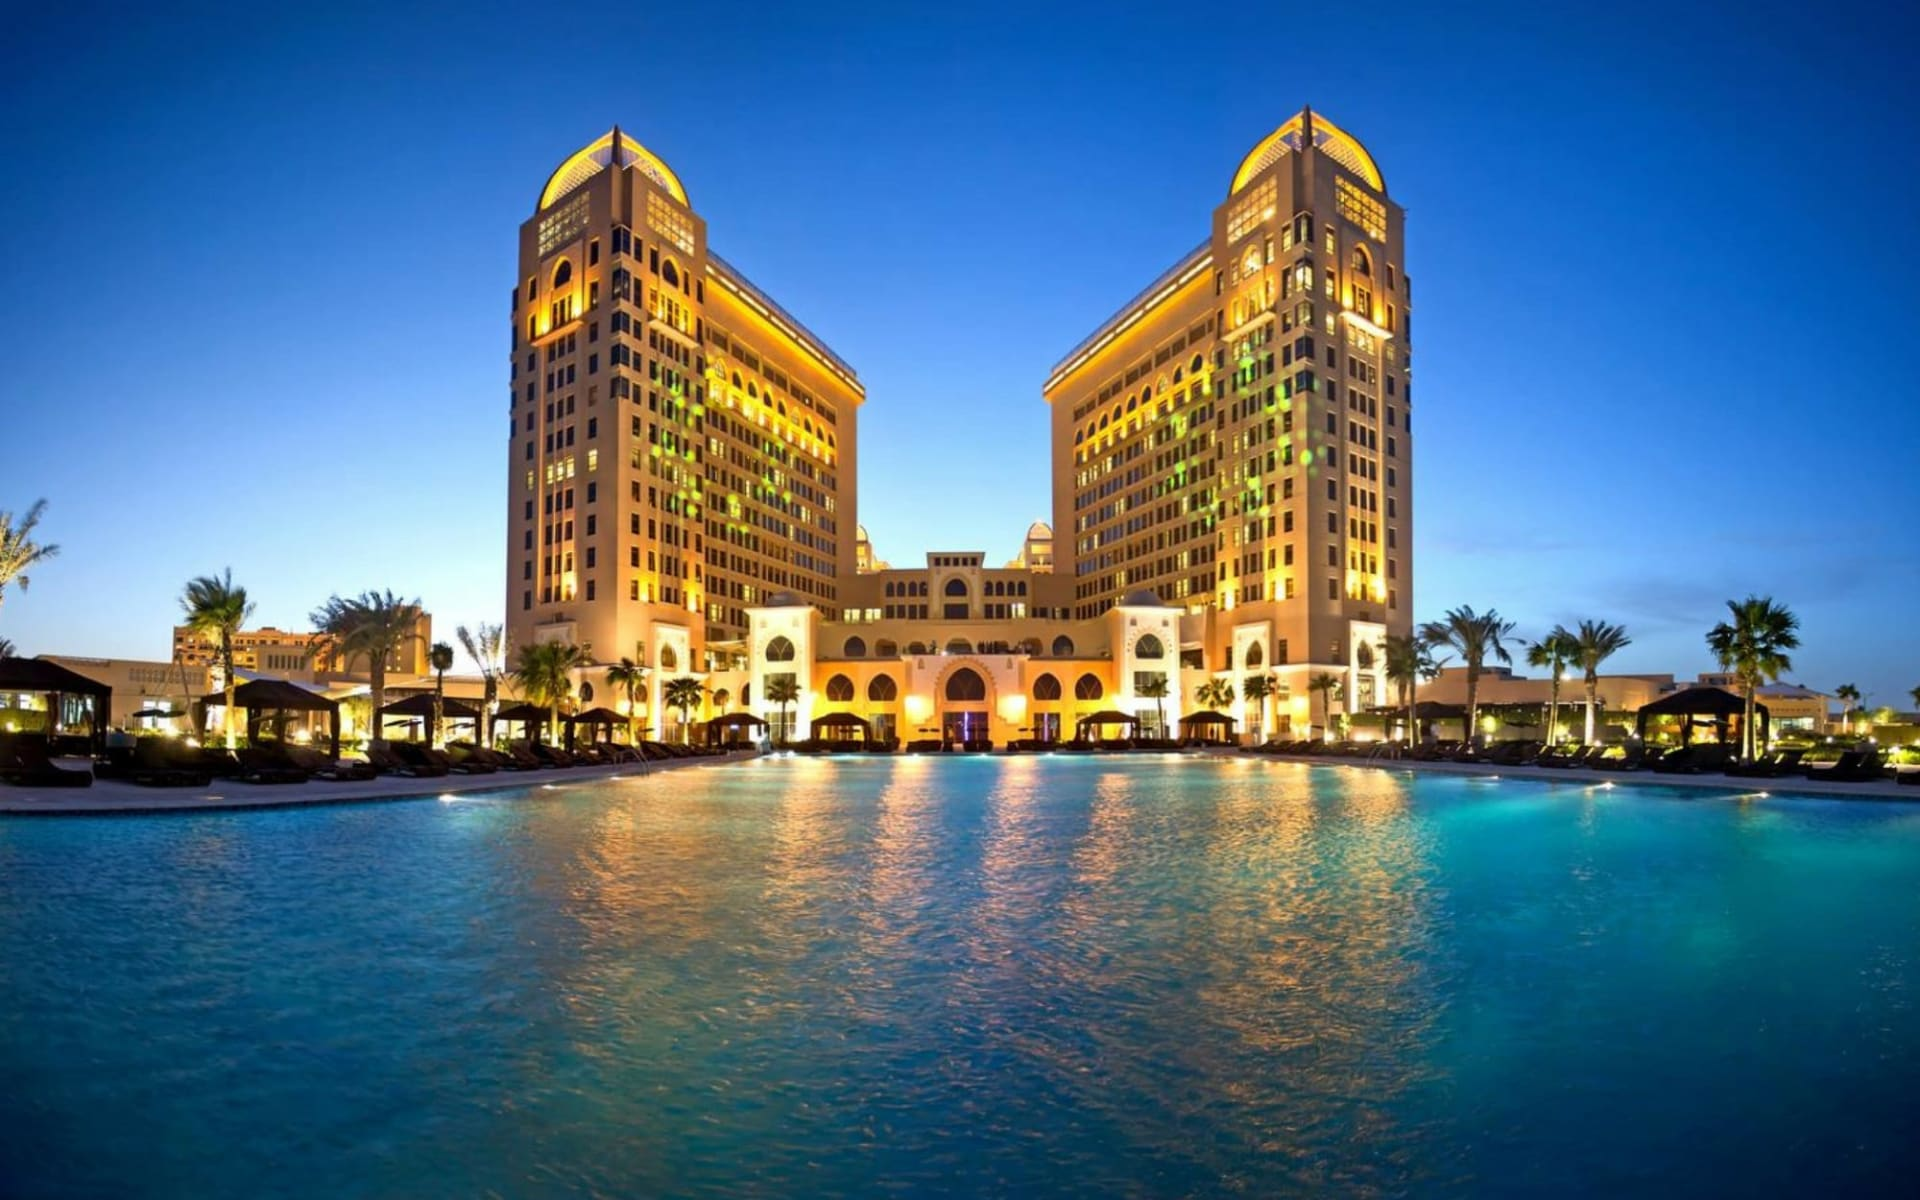 St. Regis Doha: